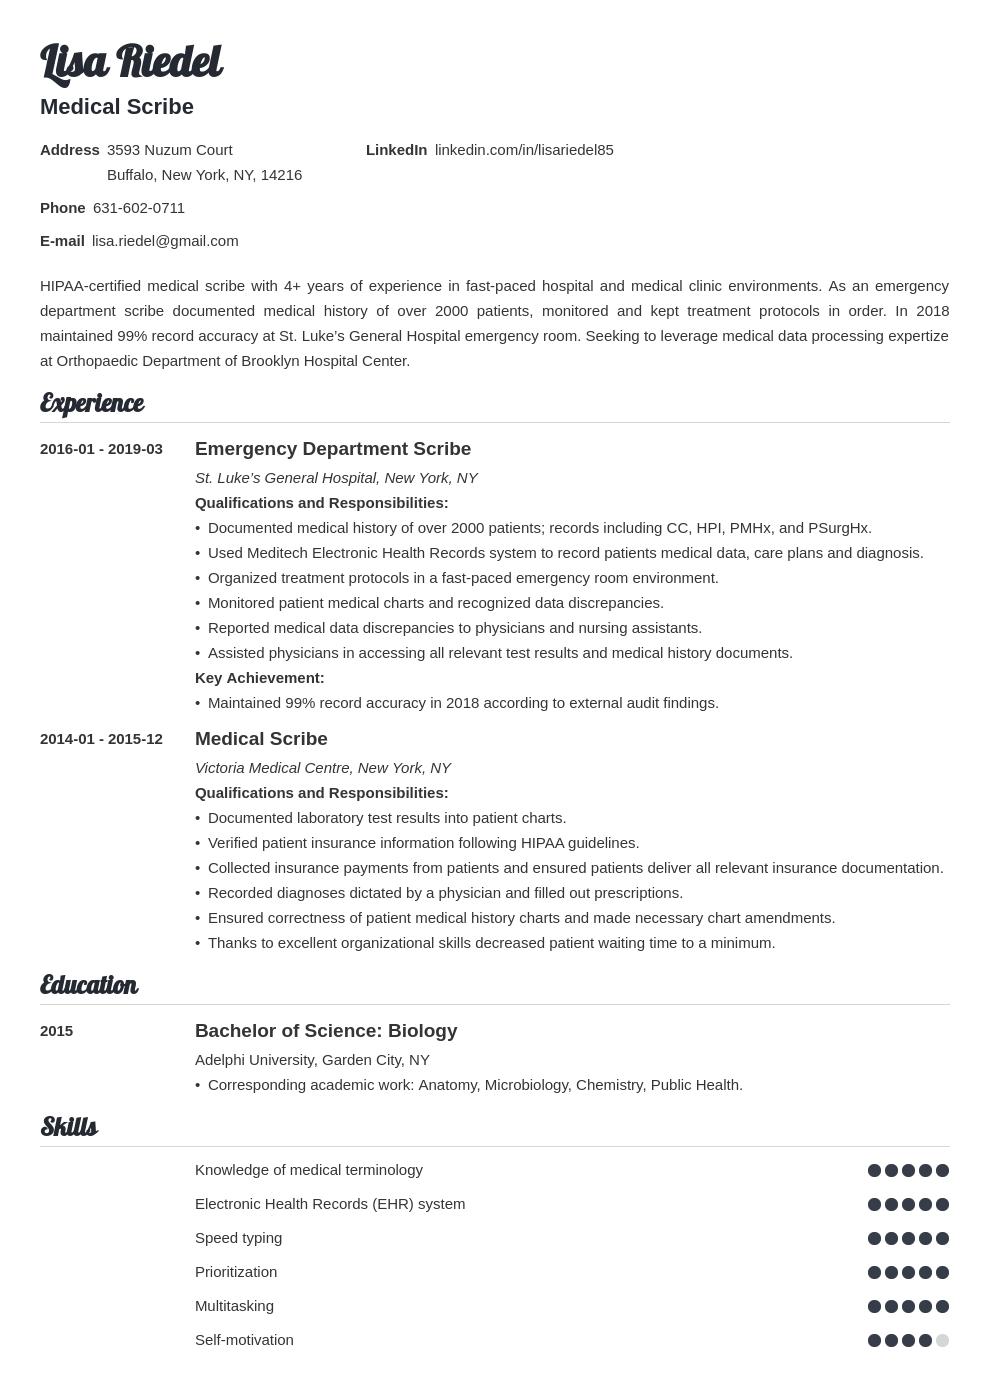 Medical Scribe Resume Example Template Valera Medical Scribe Resume Examples Job Resume Examples